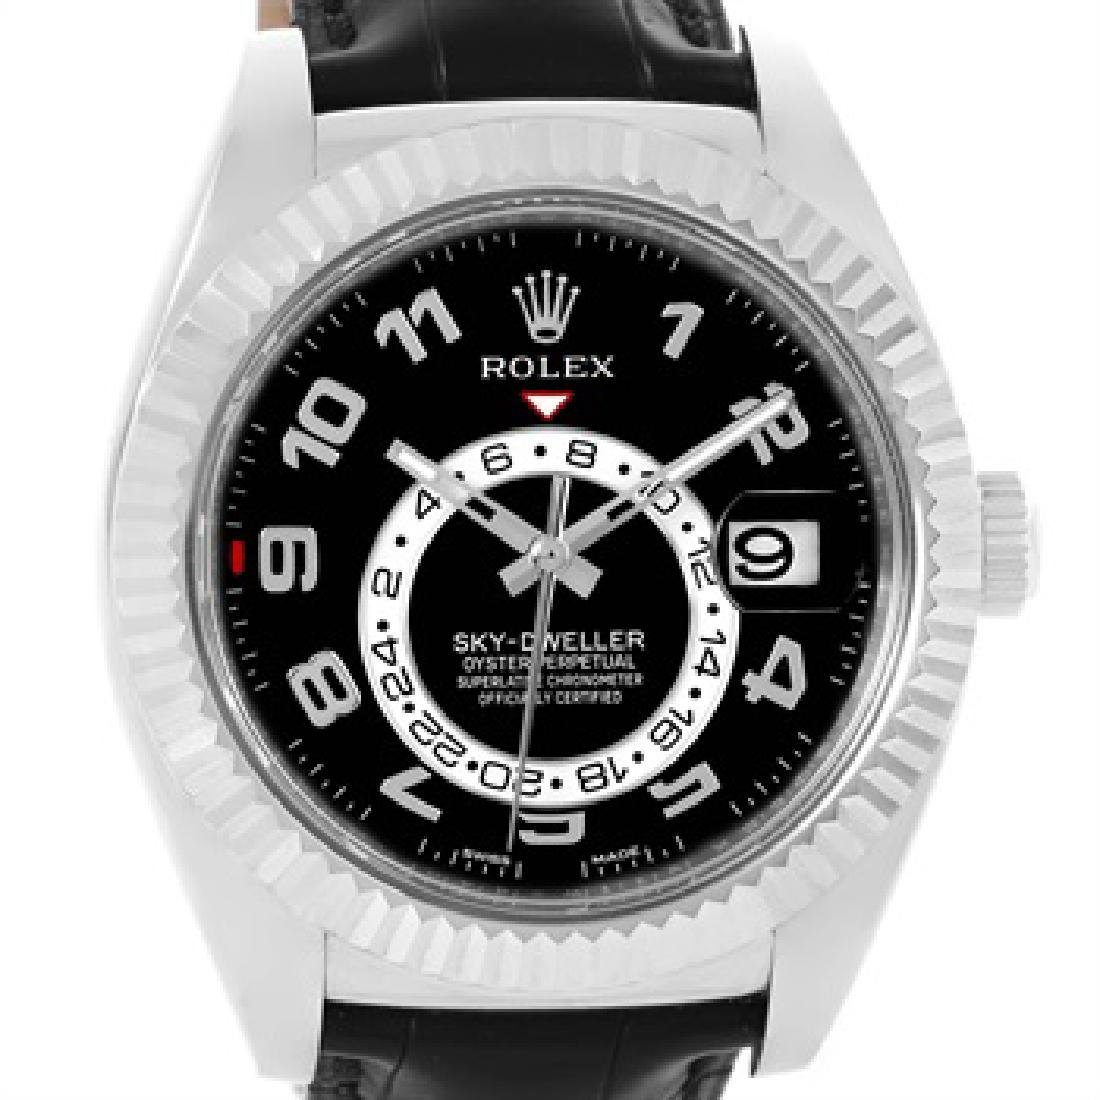 Rolex Sky-Dweller 18K White Gold Black Dial Watch